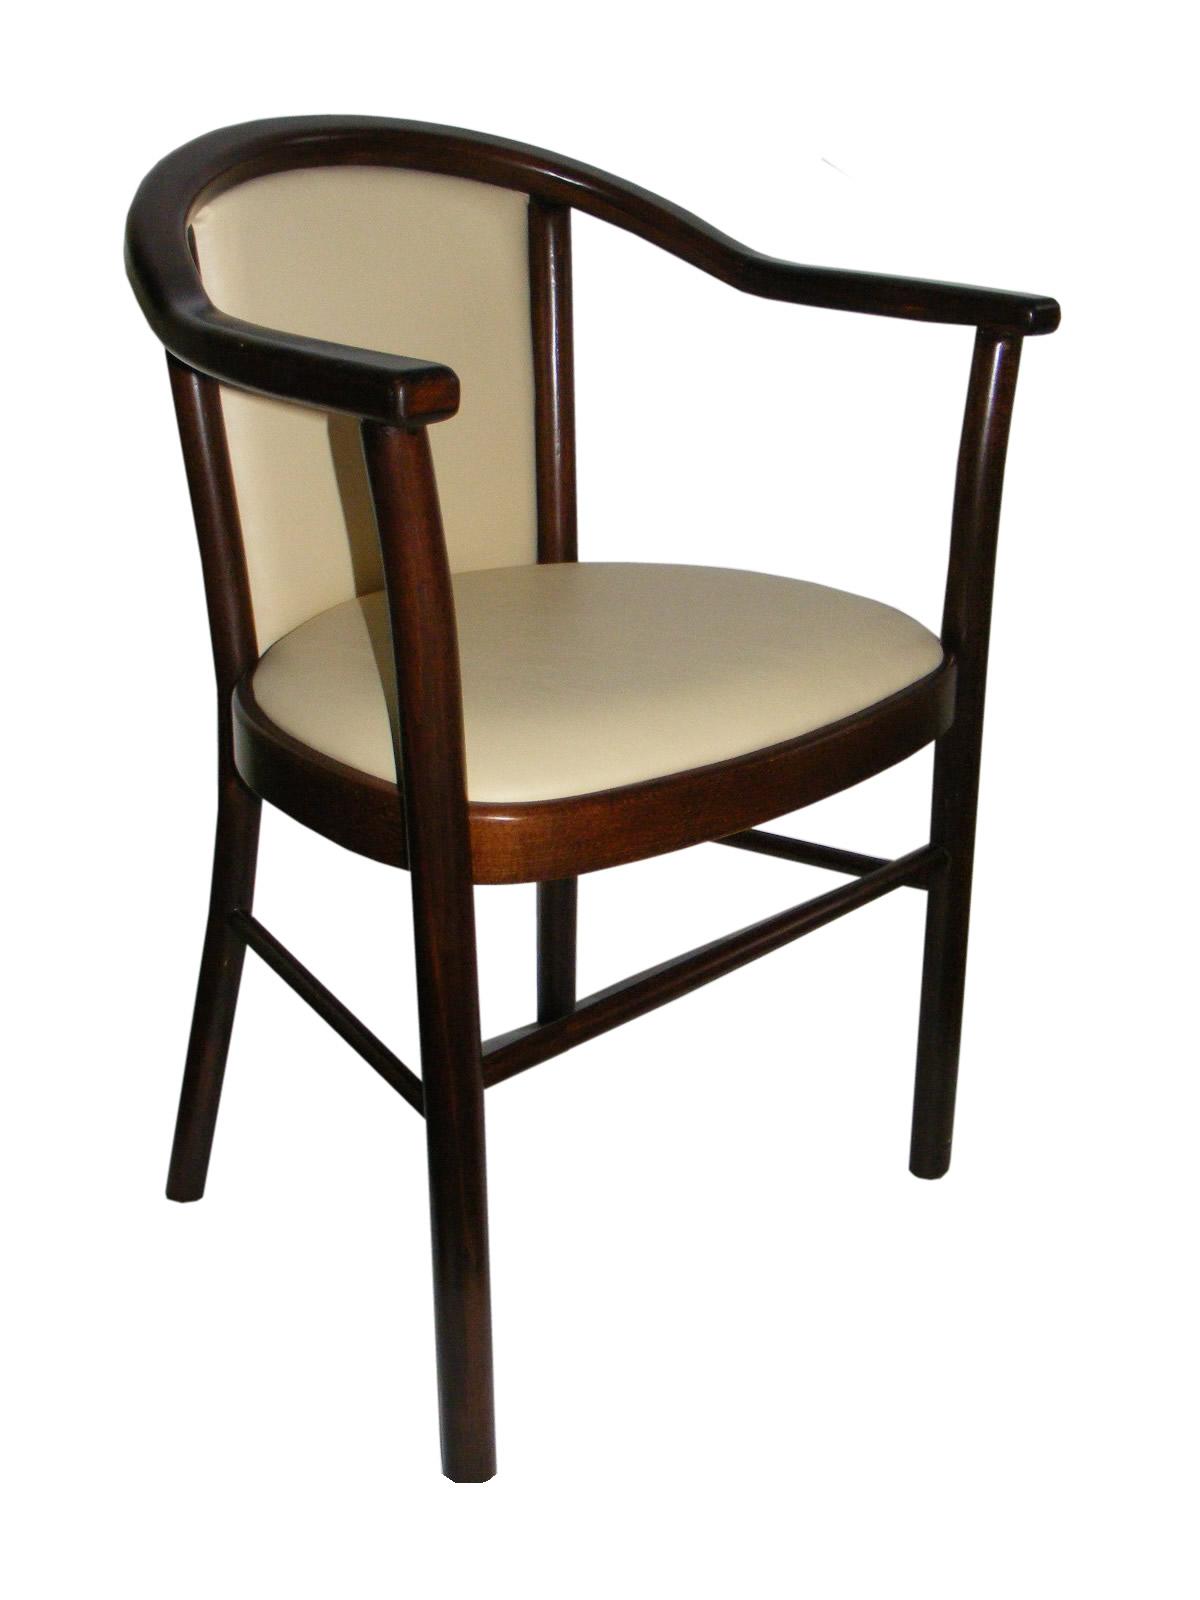 http://images.fordaq.com/p-770000-765361-D0/Restoranske-stolice--Tradicionalni.jpg